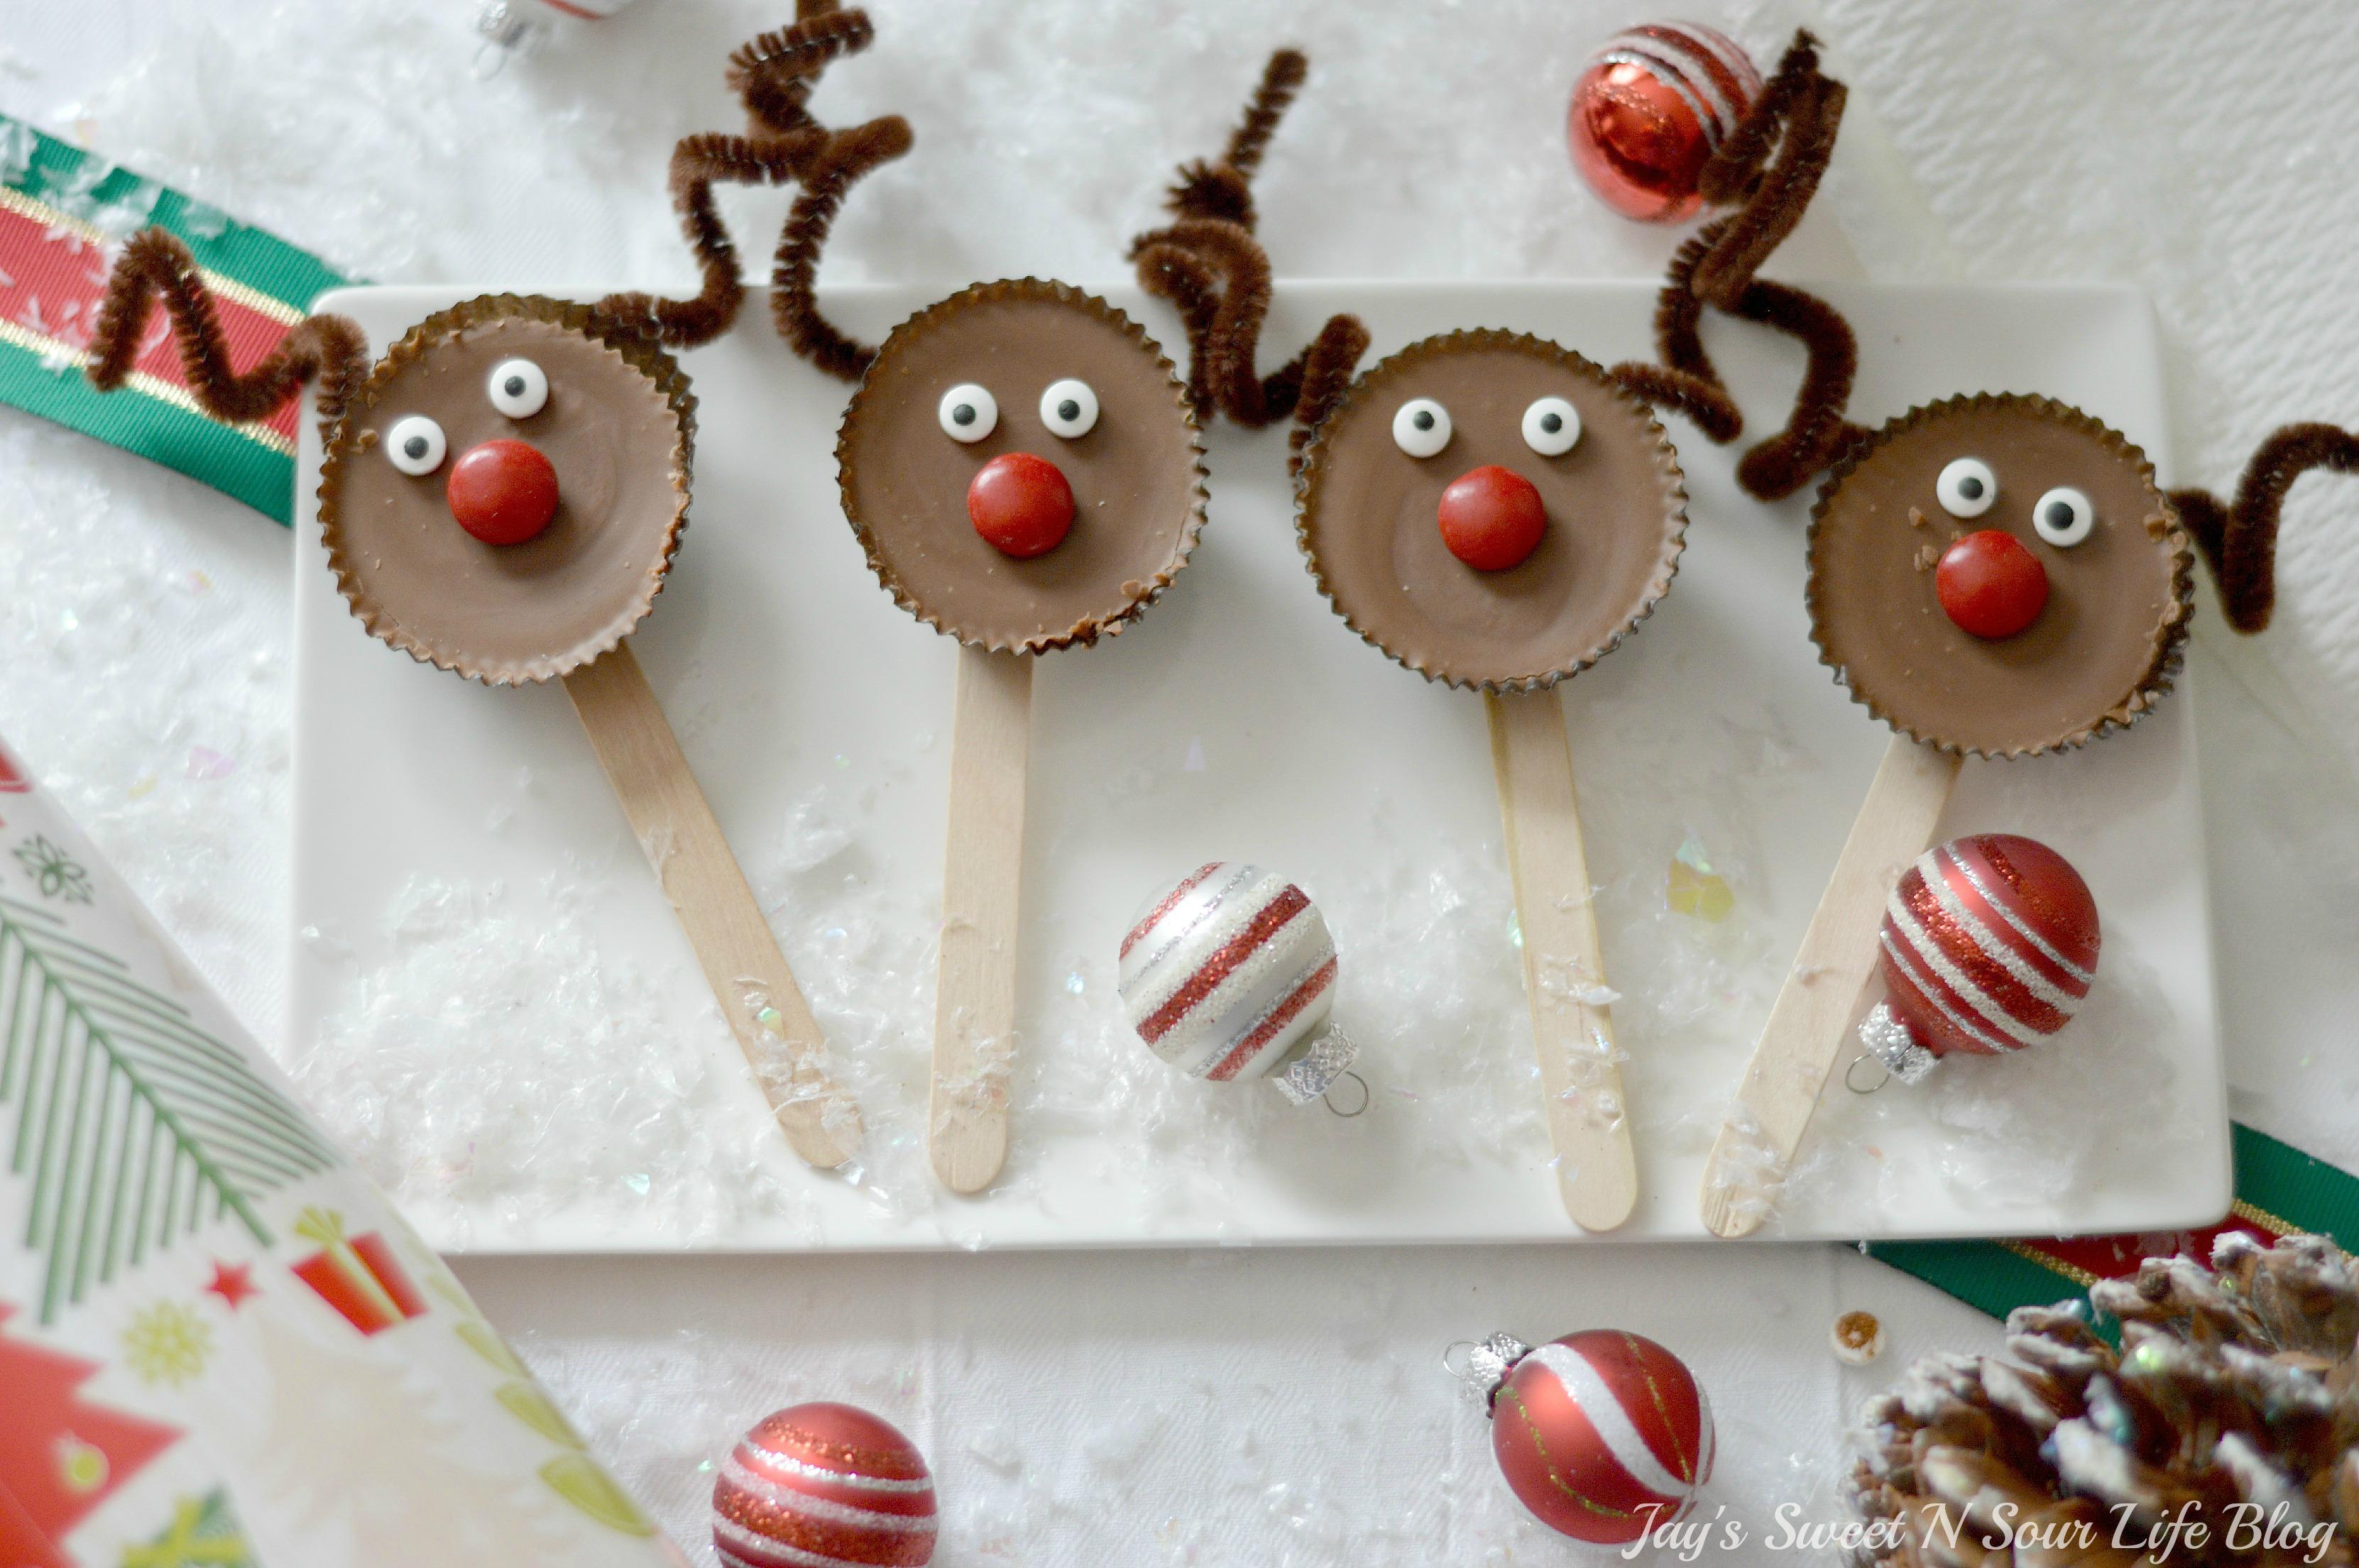 Edible Reindeer Christmas Craft. Edible Reindeer Display. Fun and easy to make, dash into the holiday season with an adorable Edible Rudolf. This Edible Christmas Craft is kid-friendly and perfect for holiday parties and gatherings.